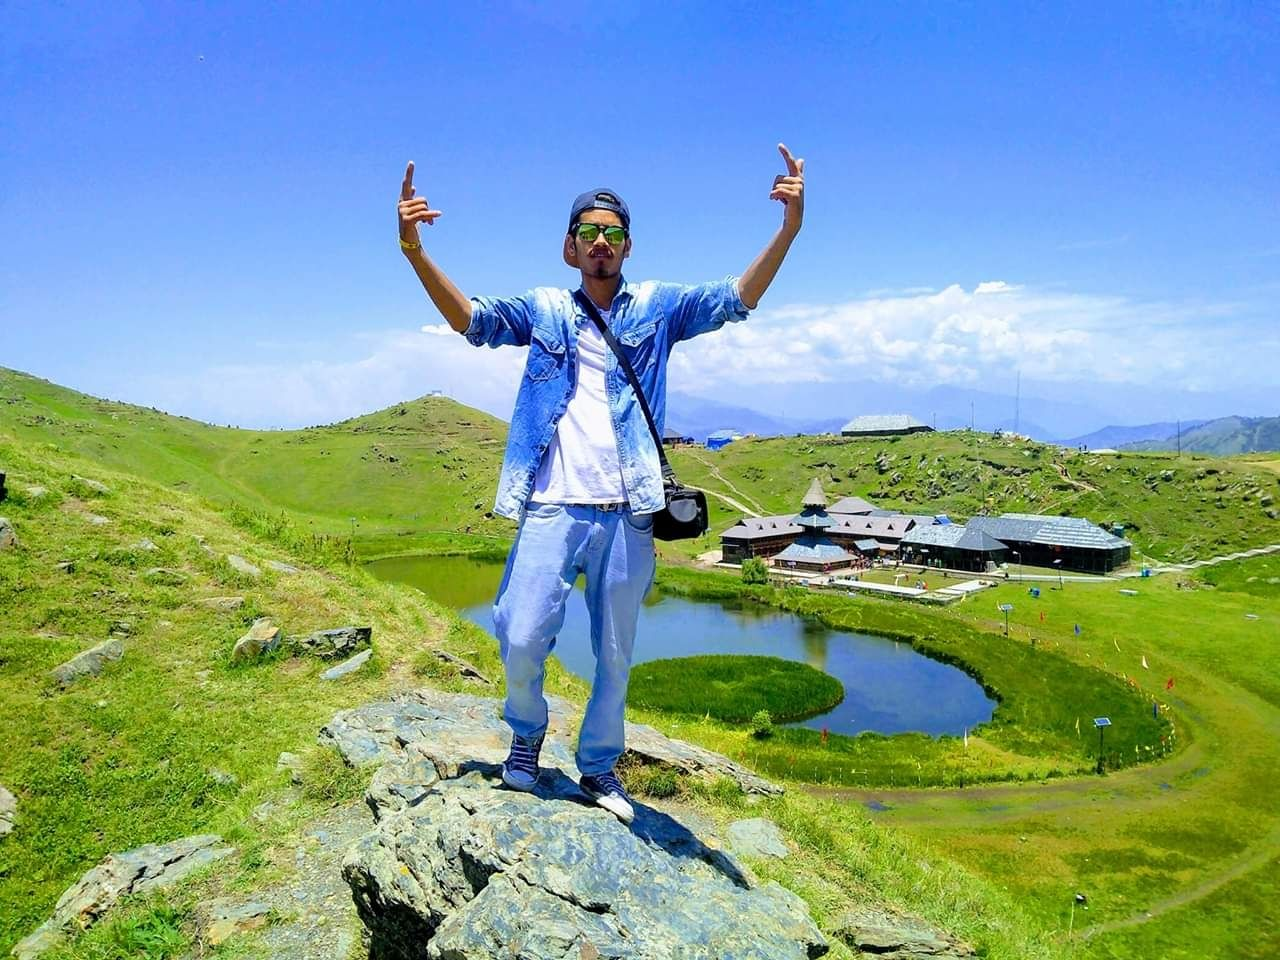 Photo of Prashar Lake Trekking and Camping By Nikhil Sharma